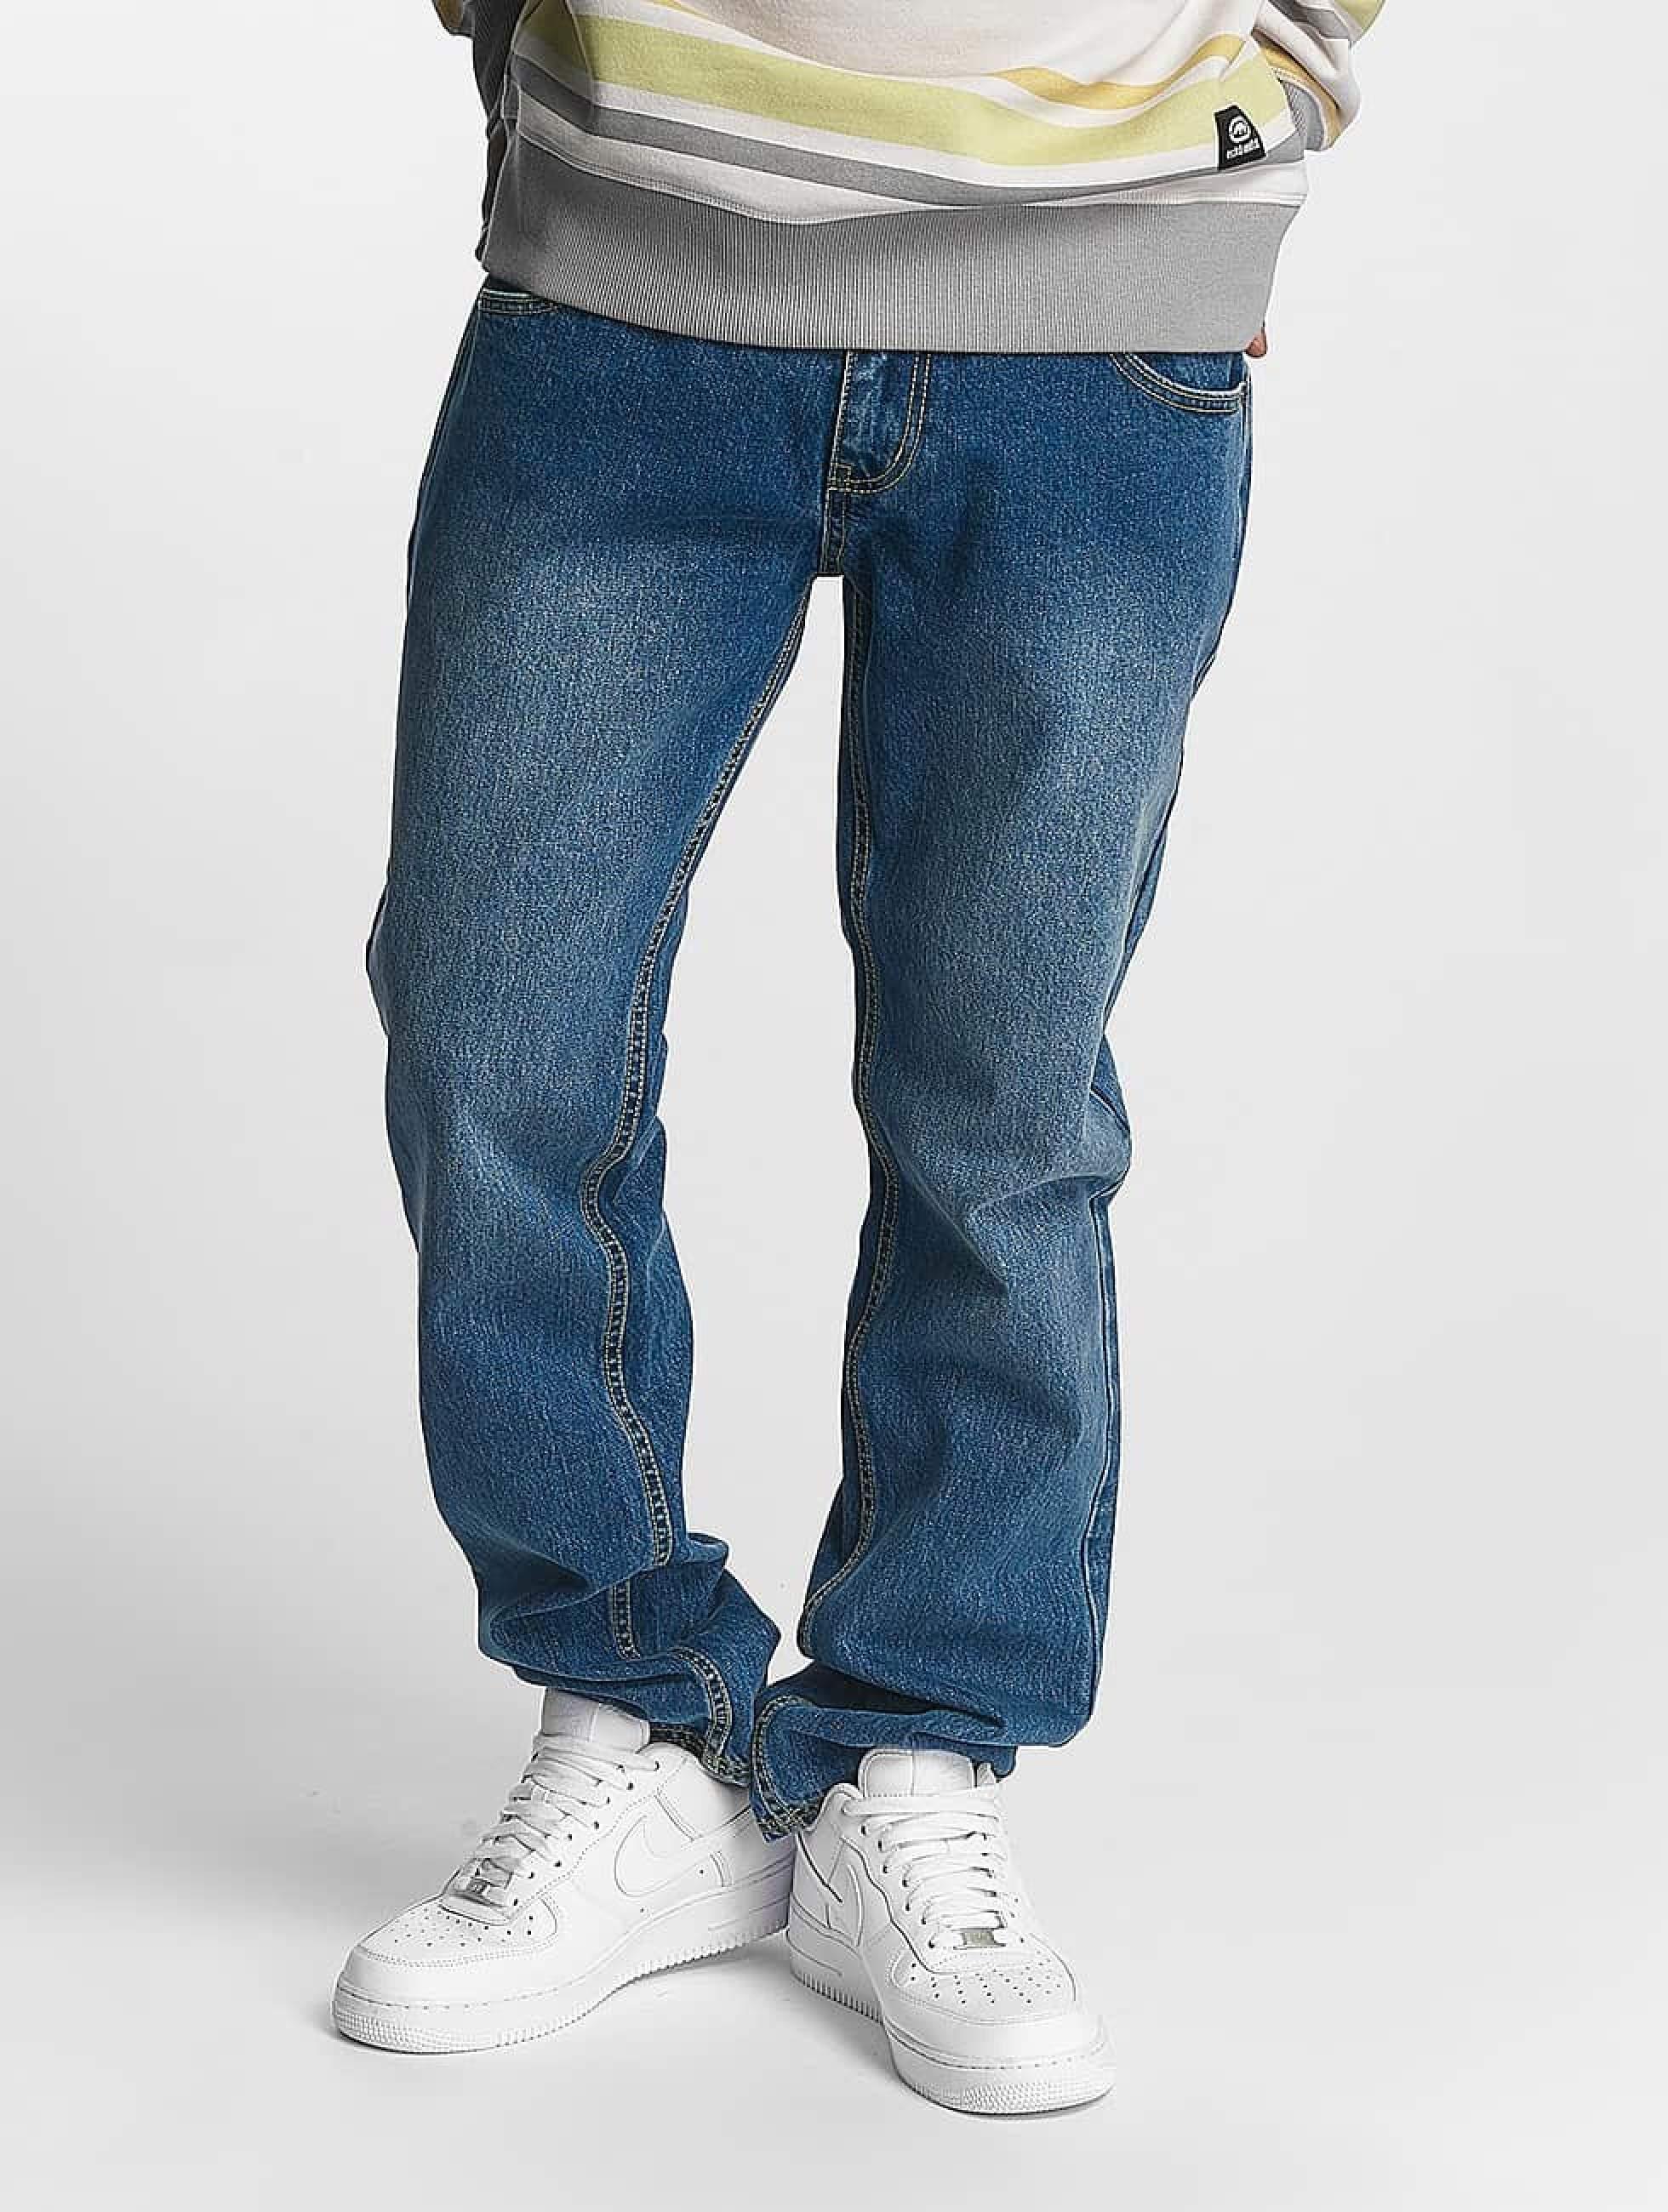 Ecko Unltd. / Straight Fit Jeans Camp's St Straight Fit in blue W 32 L 32